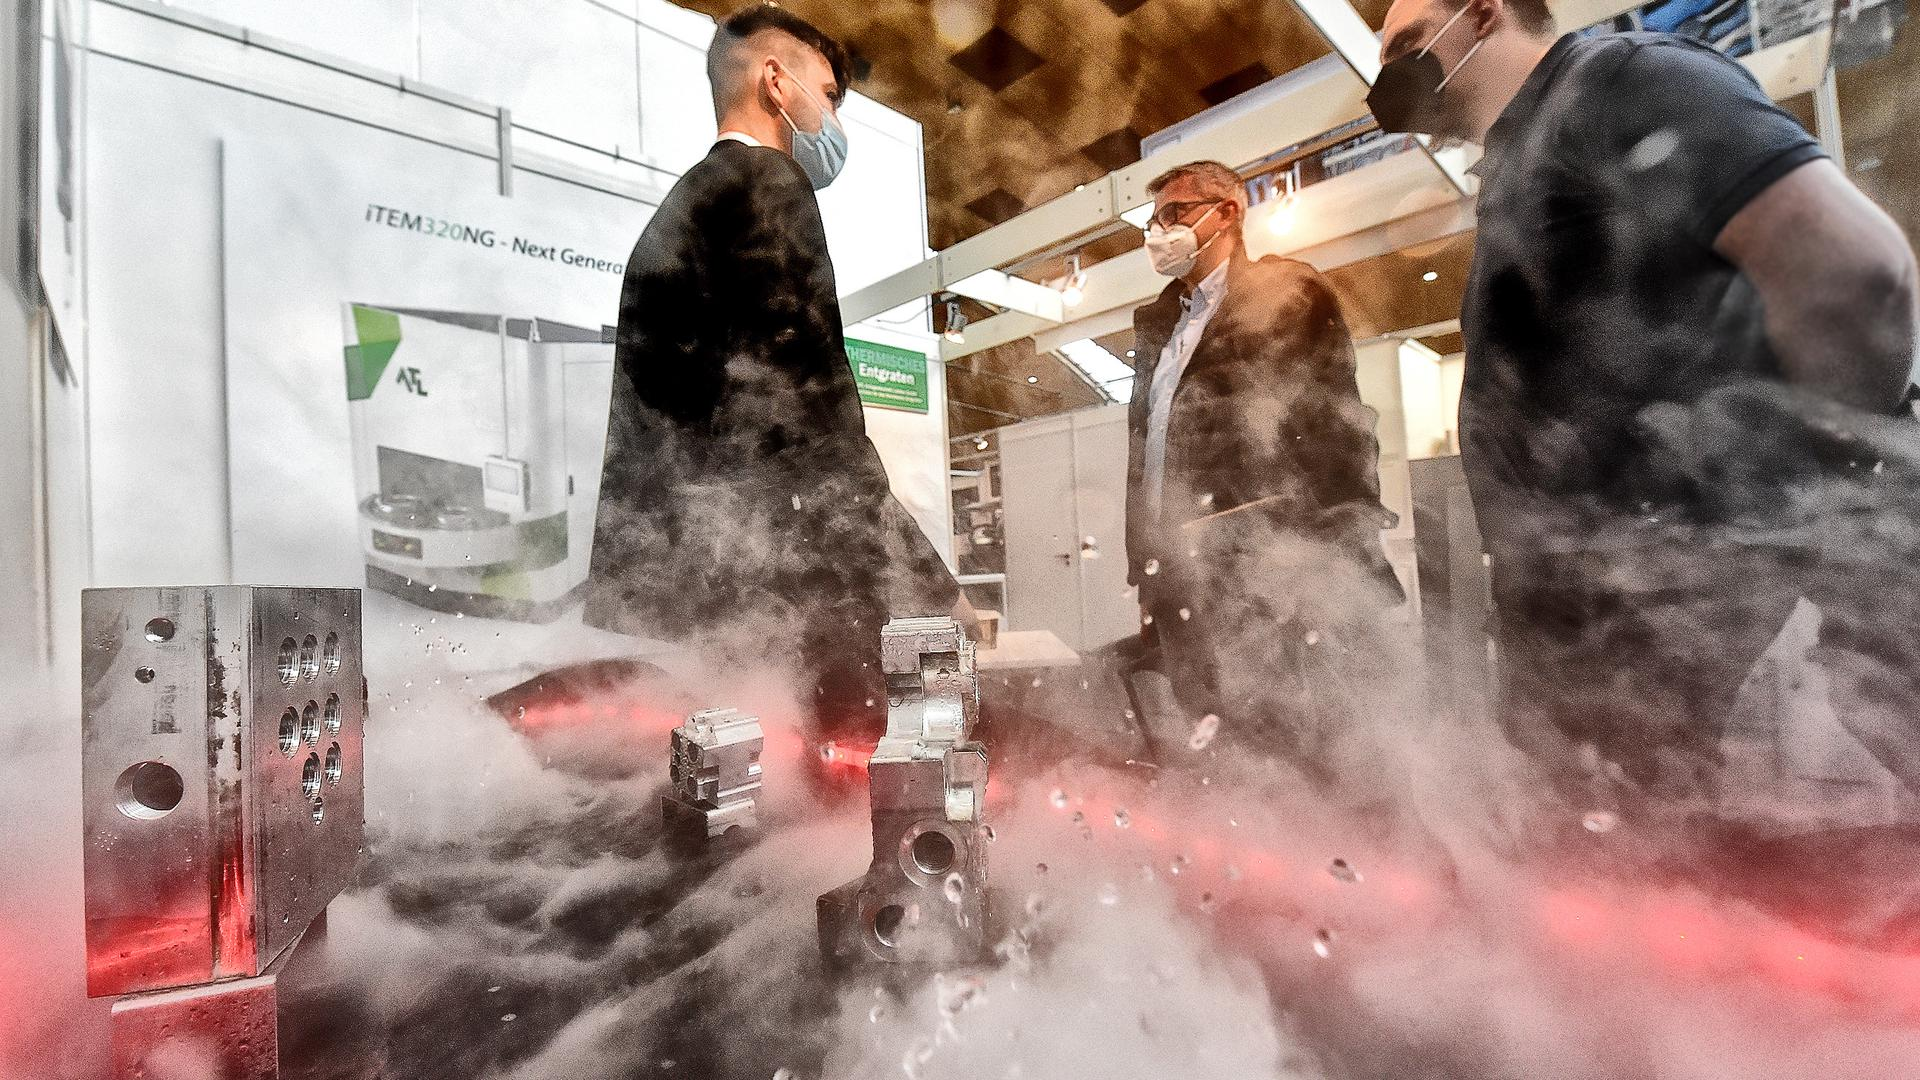 Messe Deburring EXPO Entgratungstechnik